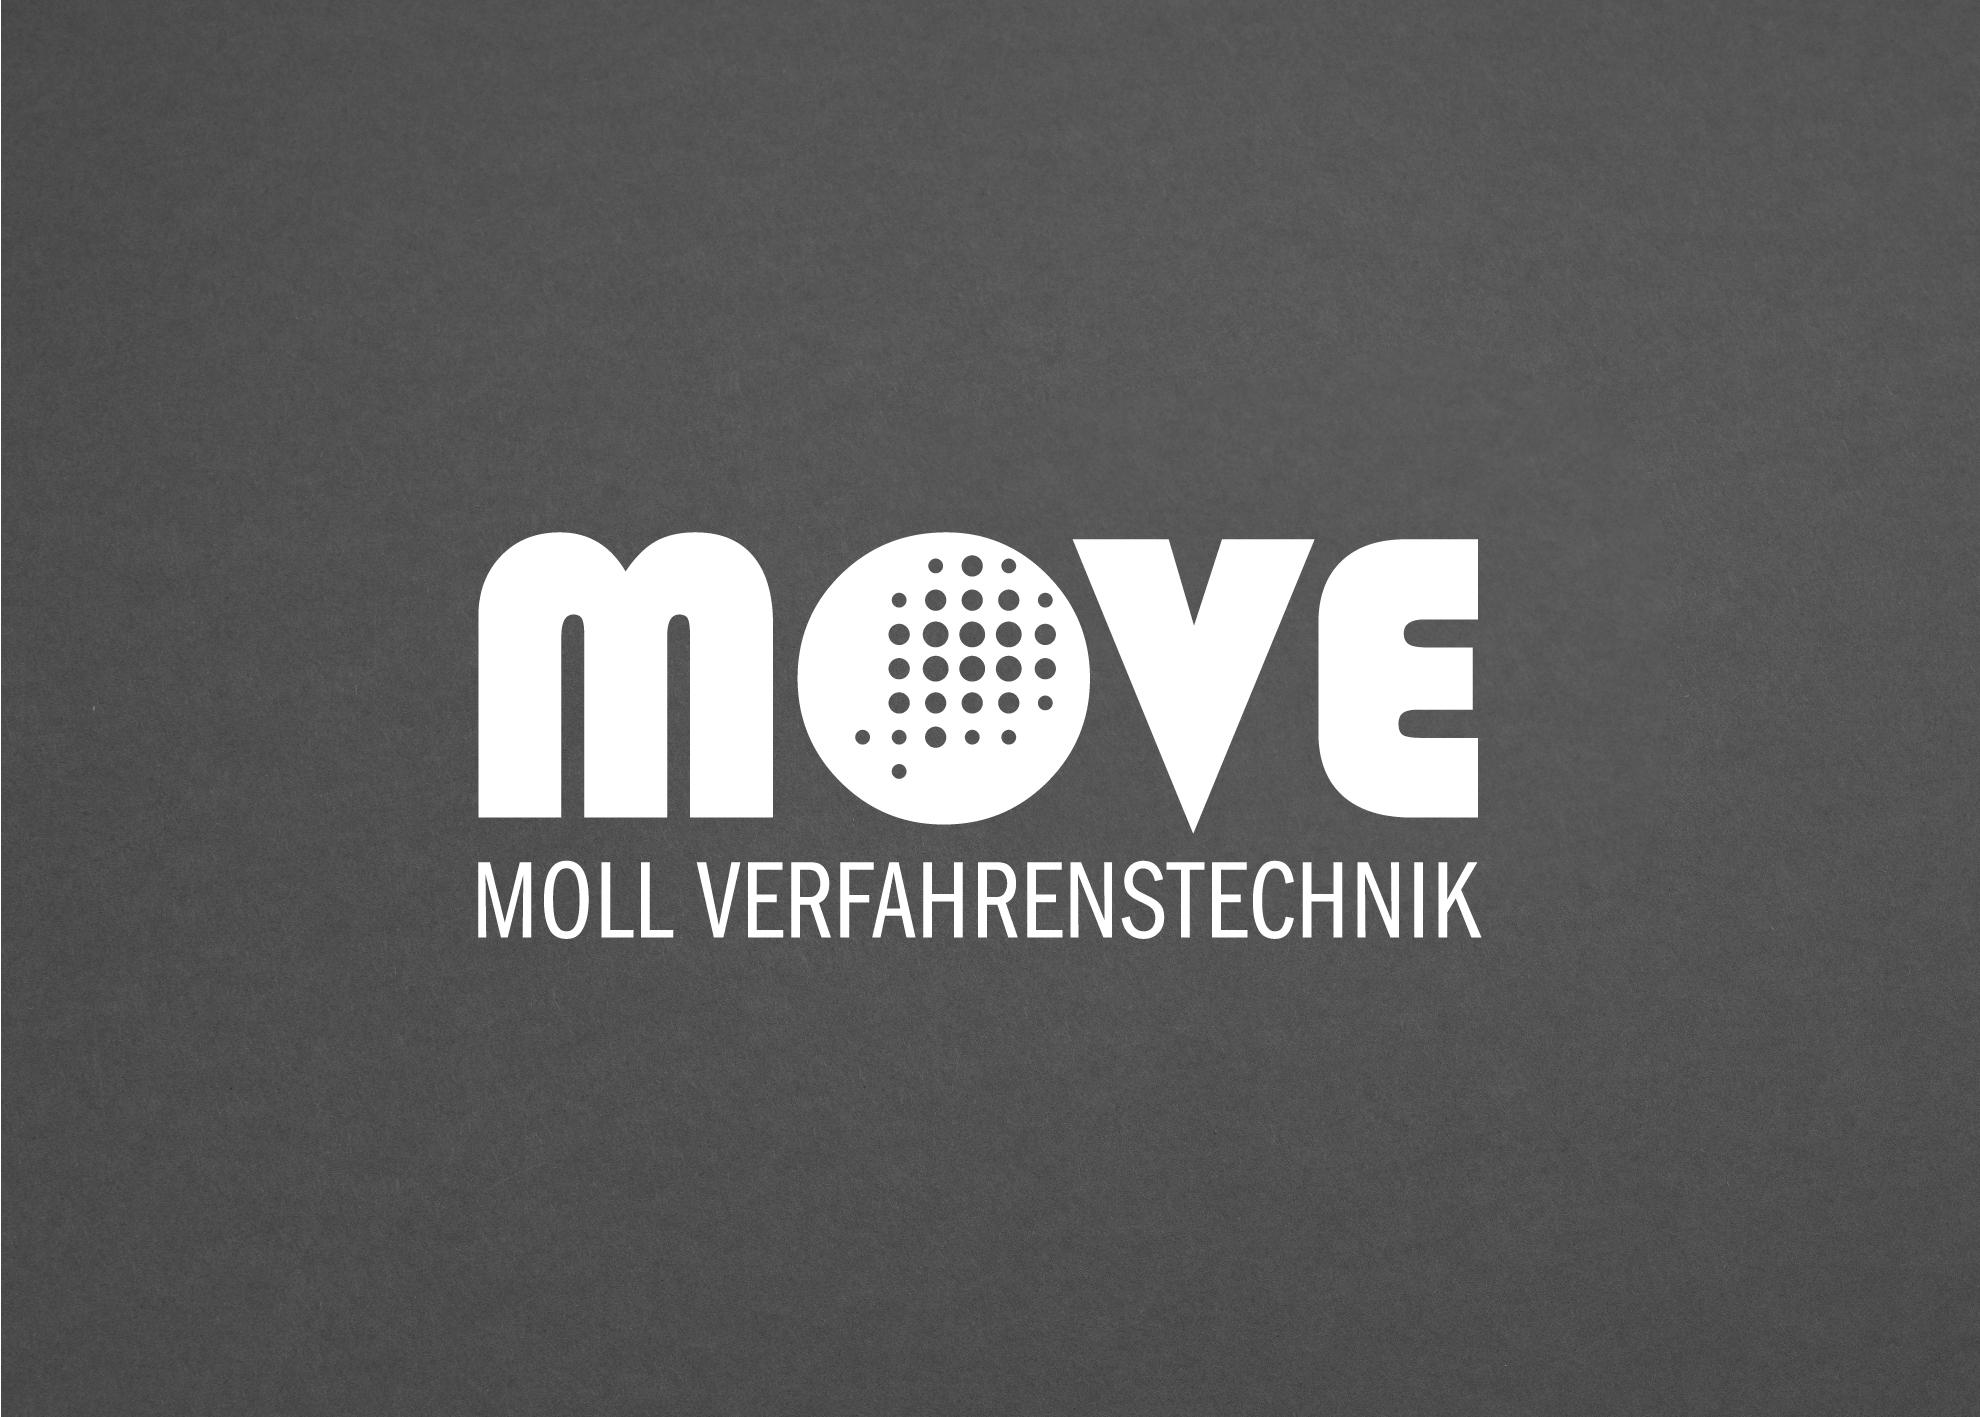 Moll Verfahrenstechnik Logogestaltung vertikale Anordnung